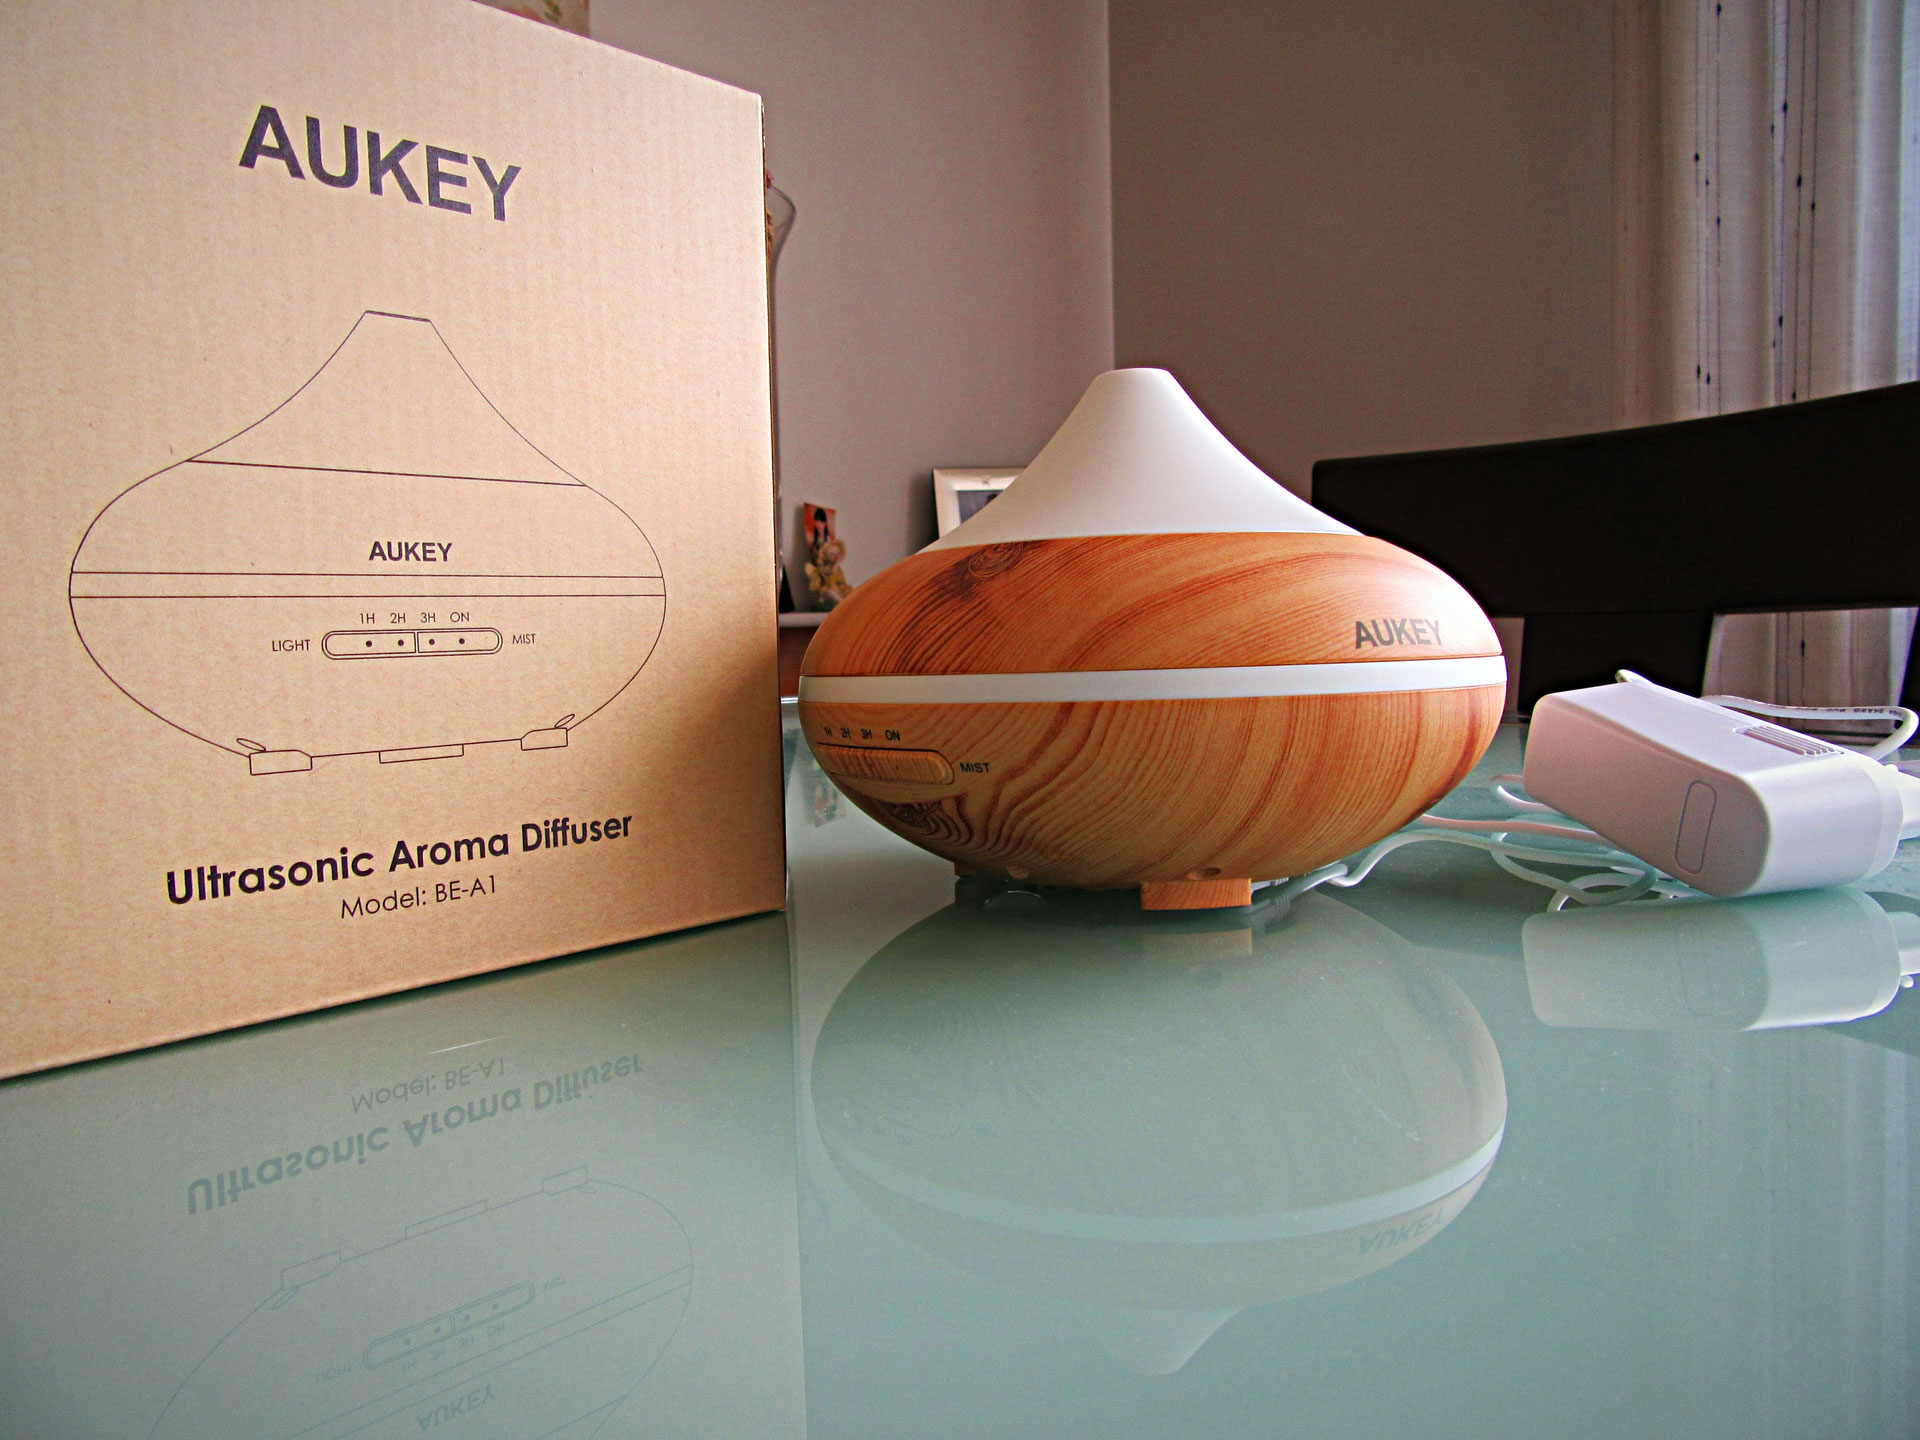 Aukey difusor de aroma android excellence - Humidificar habitacion ...